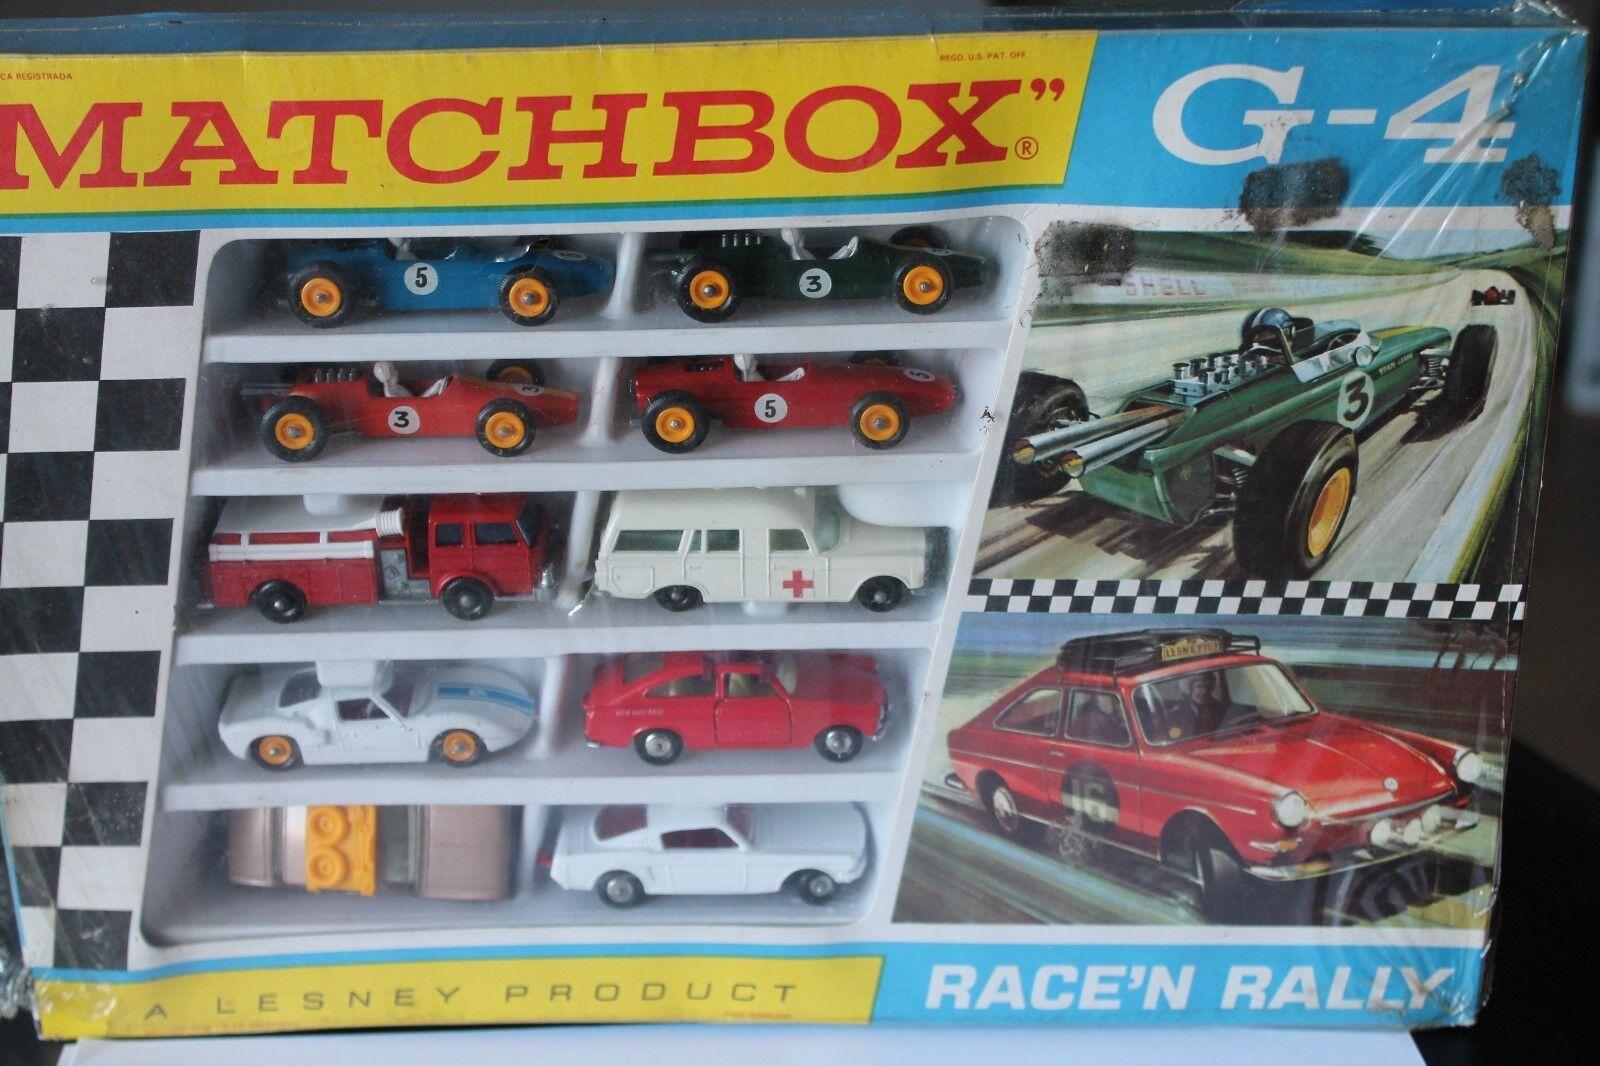 MATCHBOX Giftset  g-4  race 'N rally  1968  OVP  MINT  LESNEY  économiser 35% - 70% de réduction